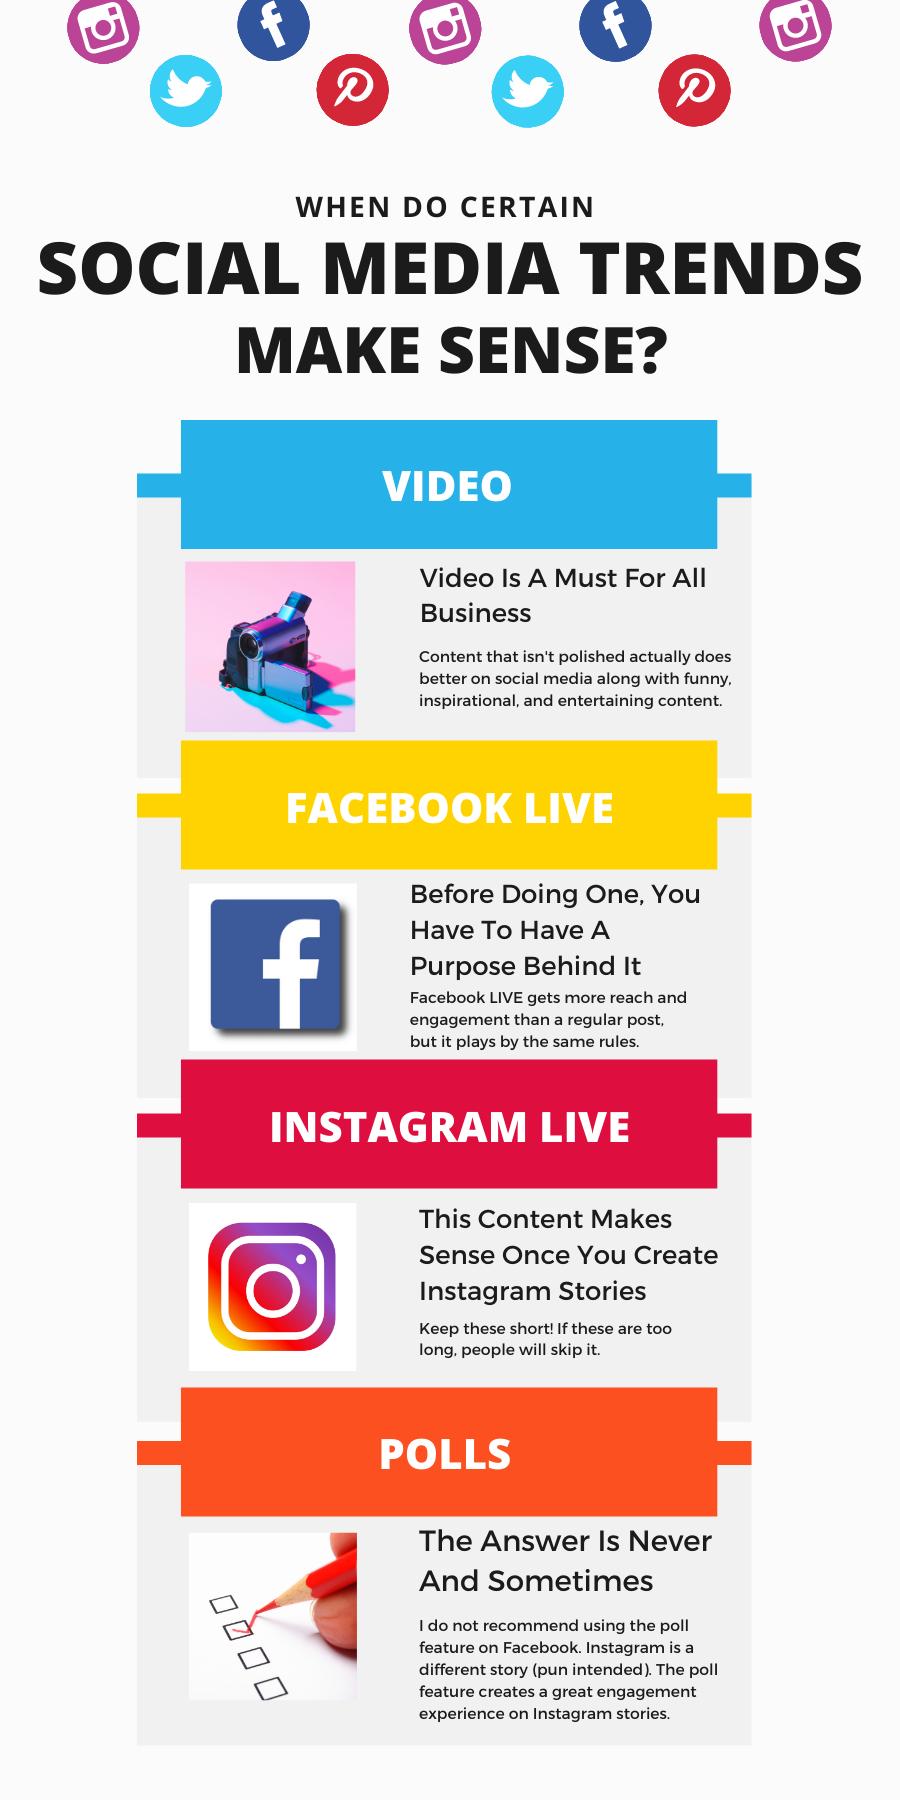 When Do Certain Social Media Trends Make Sense Social Media Marketing Social Media Trends Media Strategy Social Media